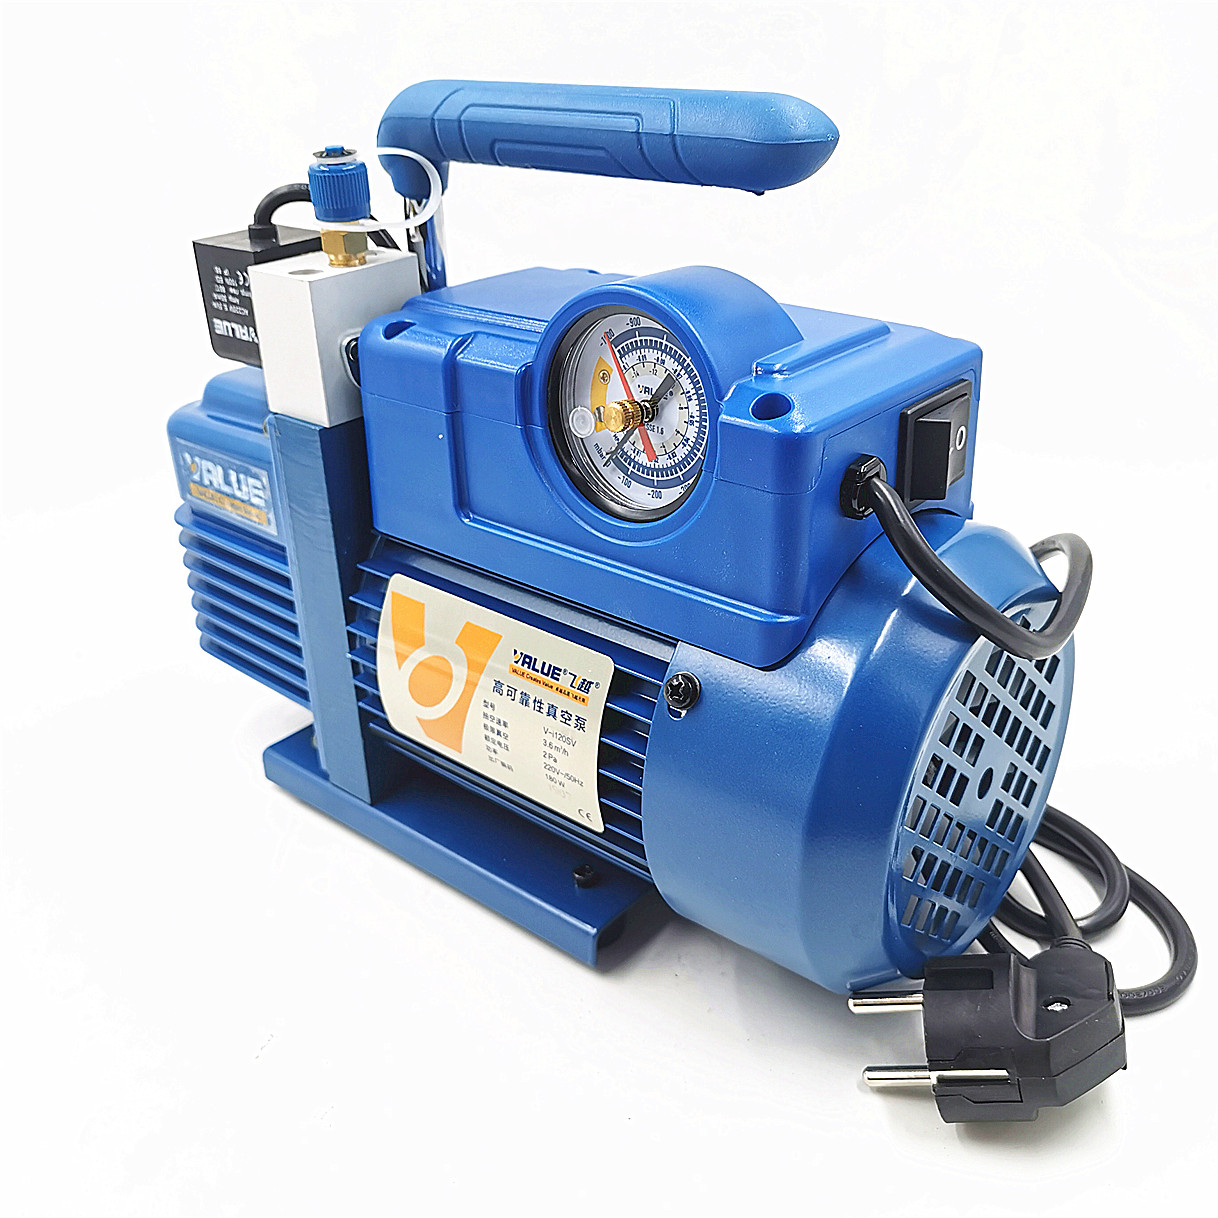 220V 180W V-i120SV New Refrigerant Vacuum Pump Air Conditioning Pump Vacuum Pump For R410A, R407C, R134a, R12, R22